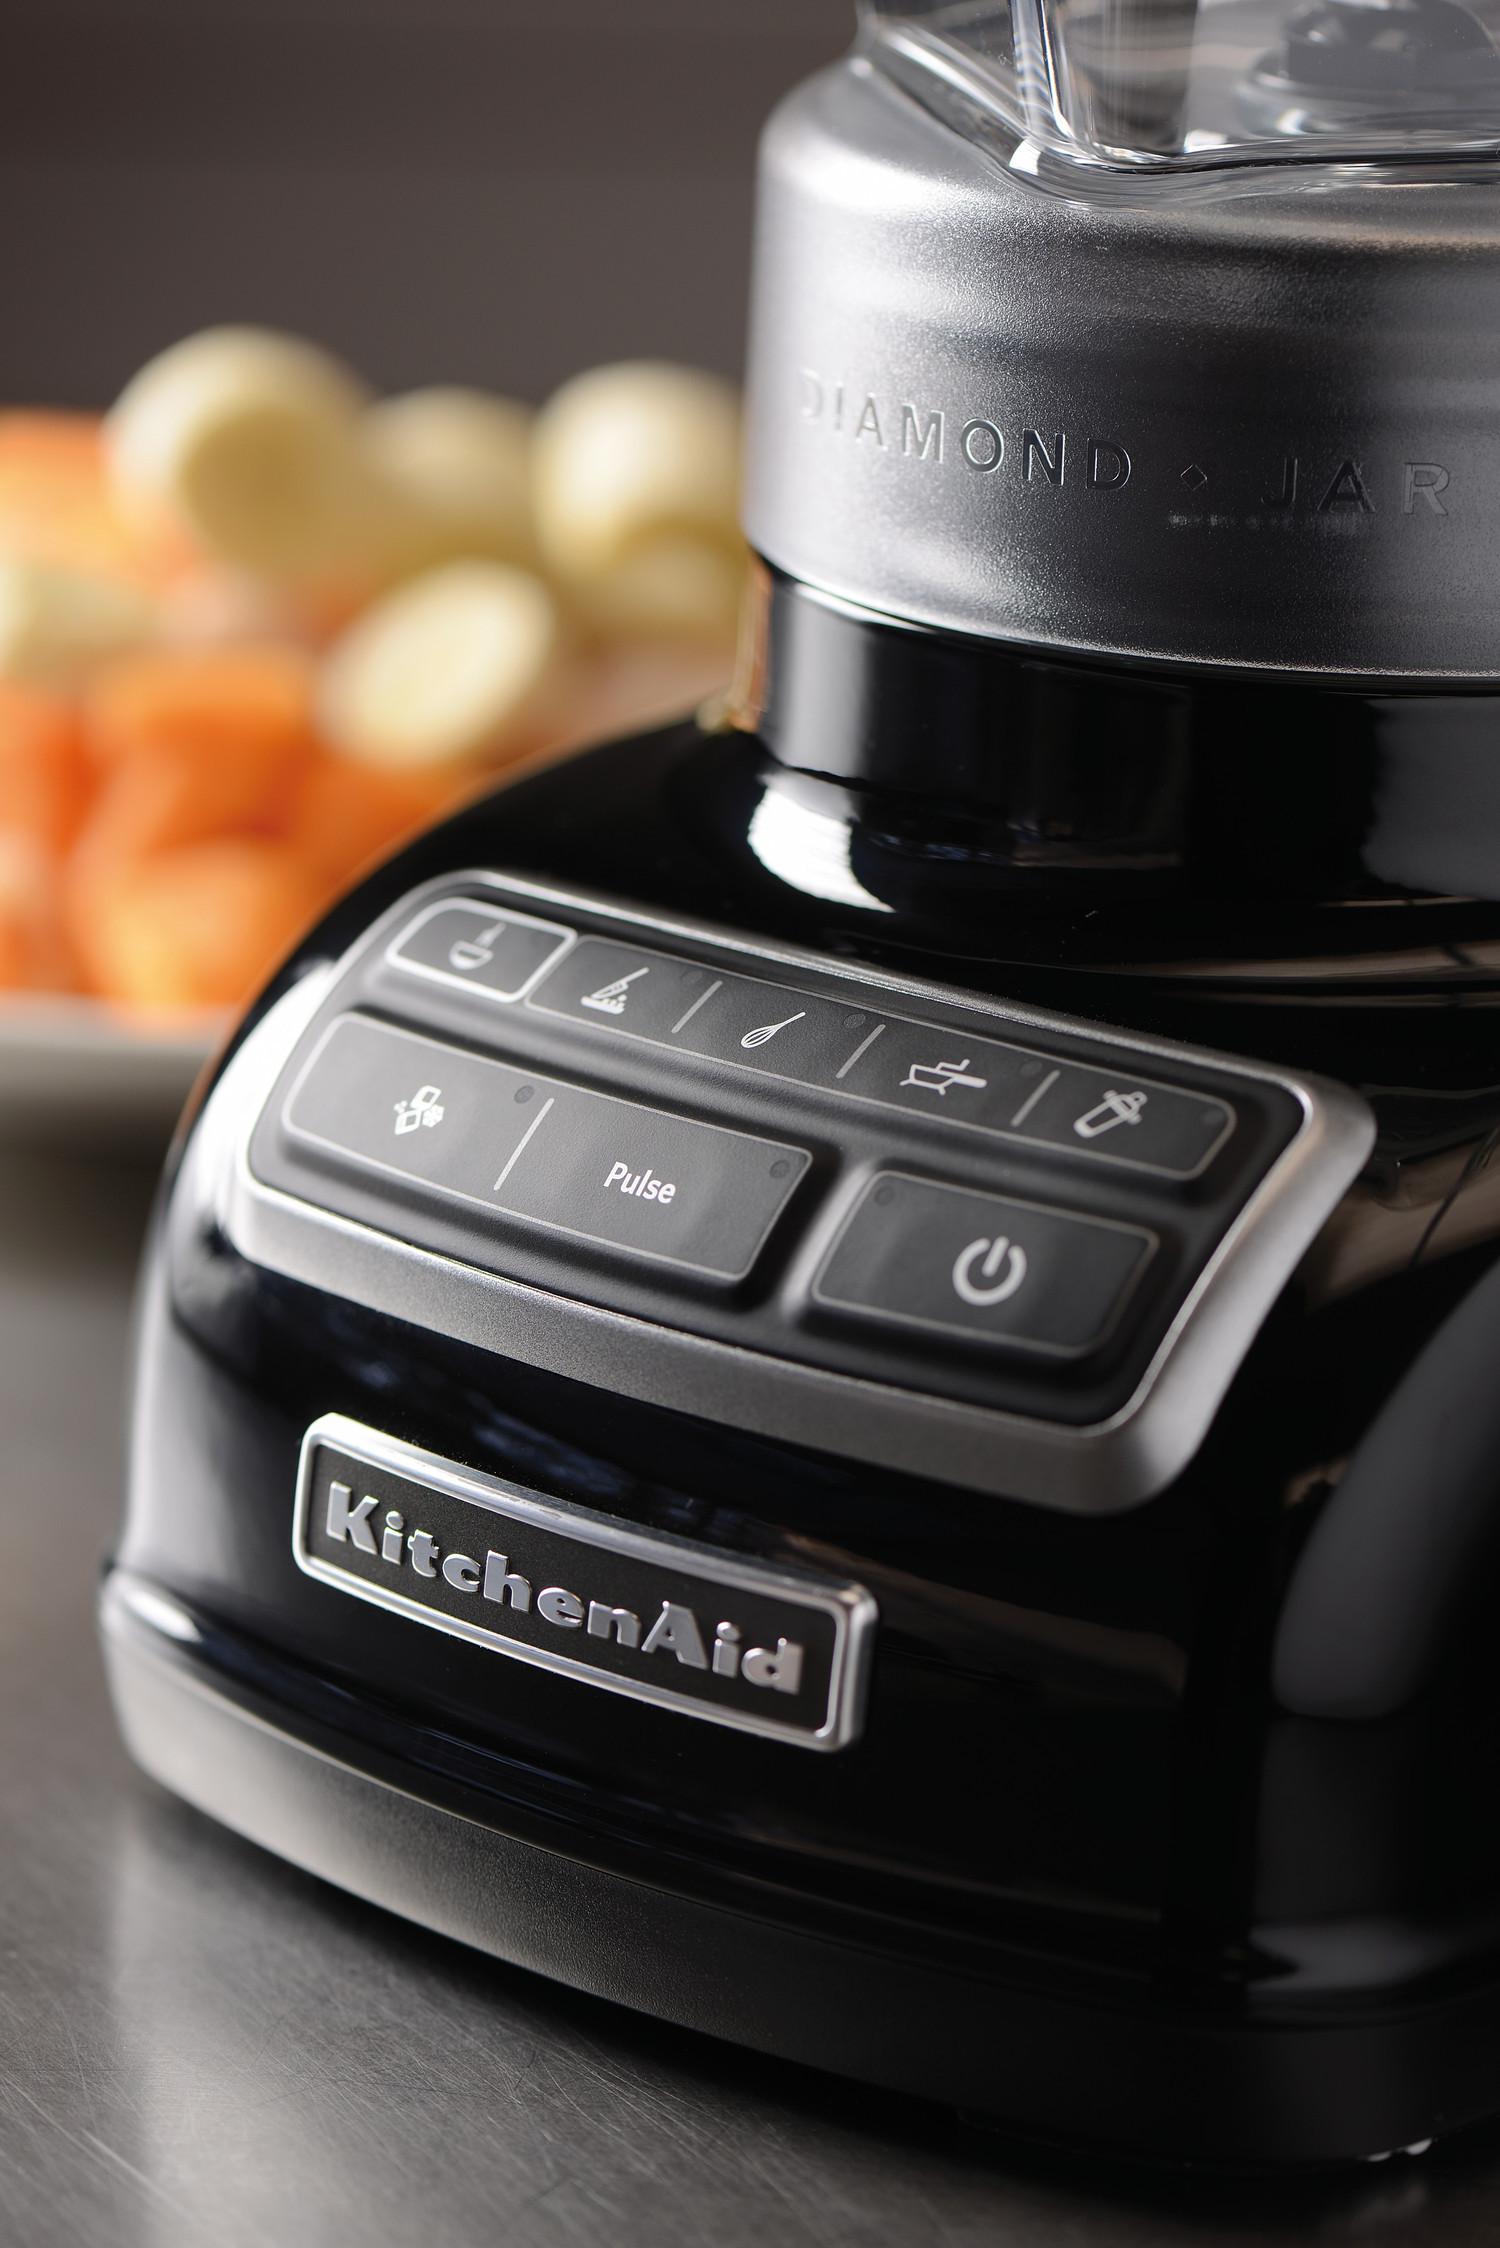 KitchenAid Rauten-Standmixer